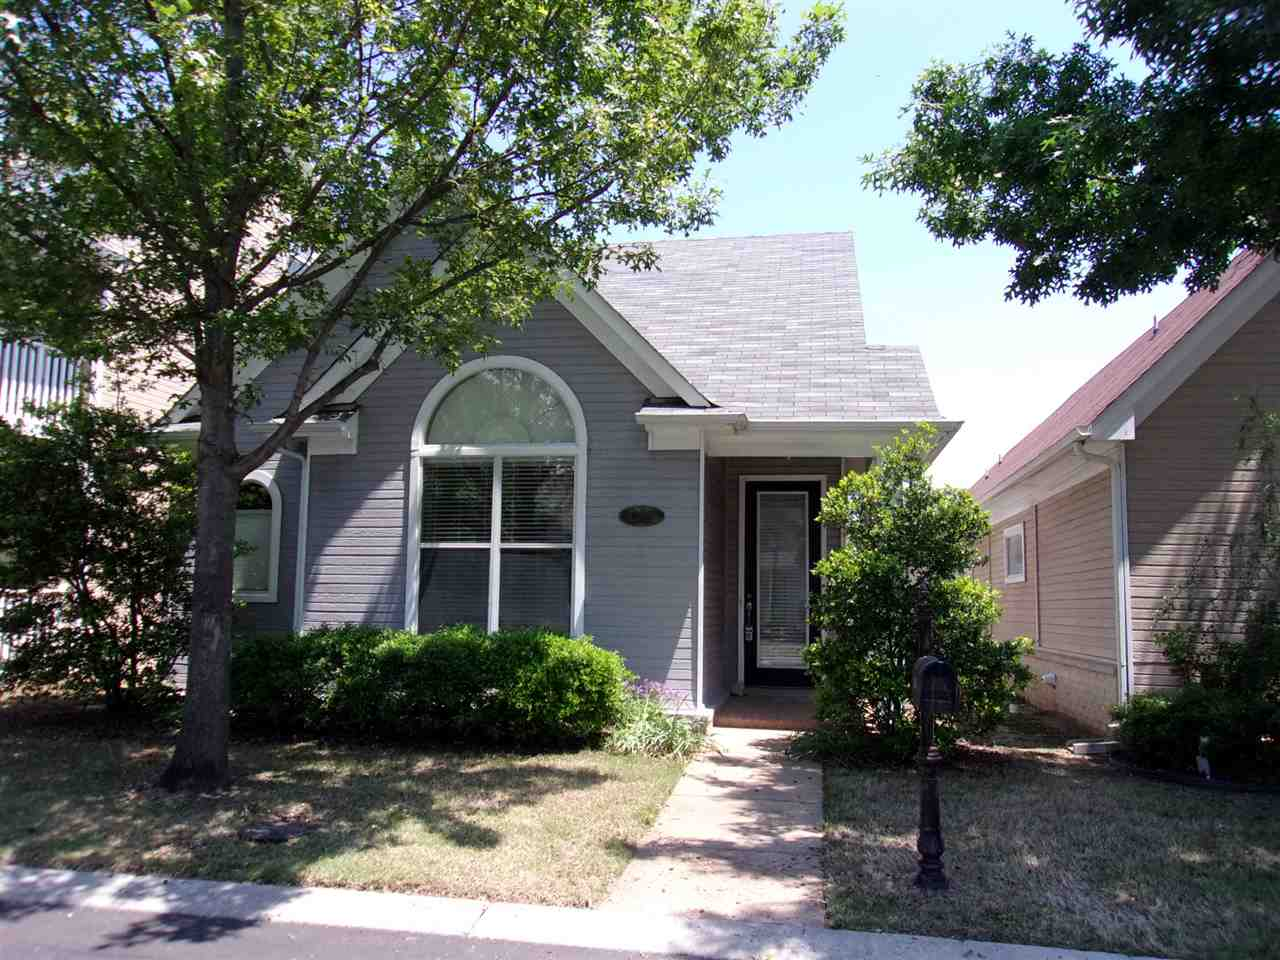 Property for sale at 1368 Harbor Park Dr, Memphis,  TN 38103